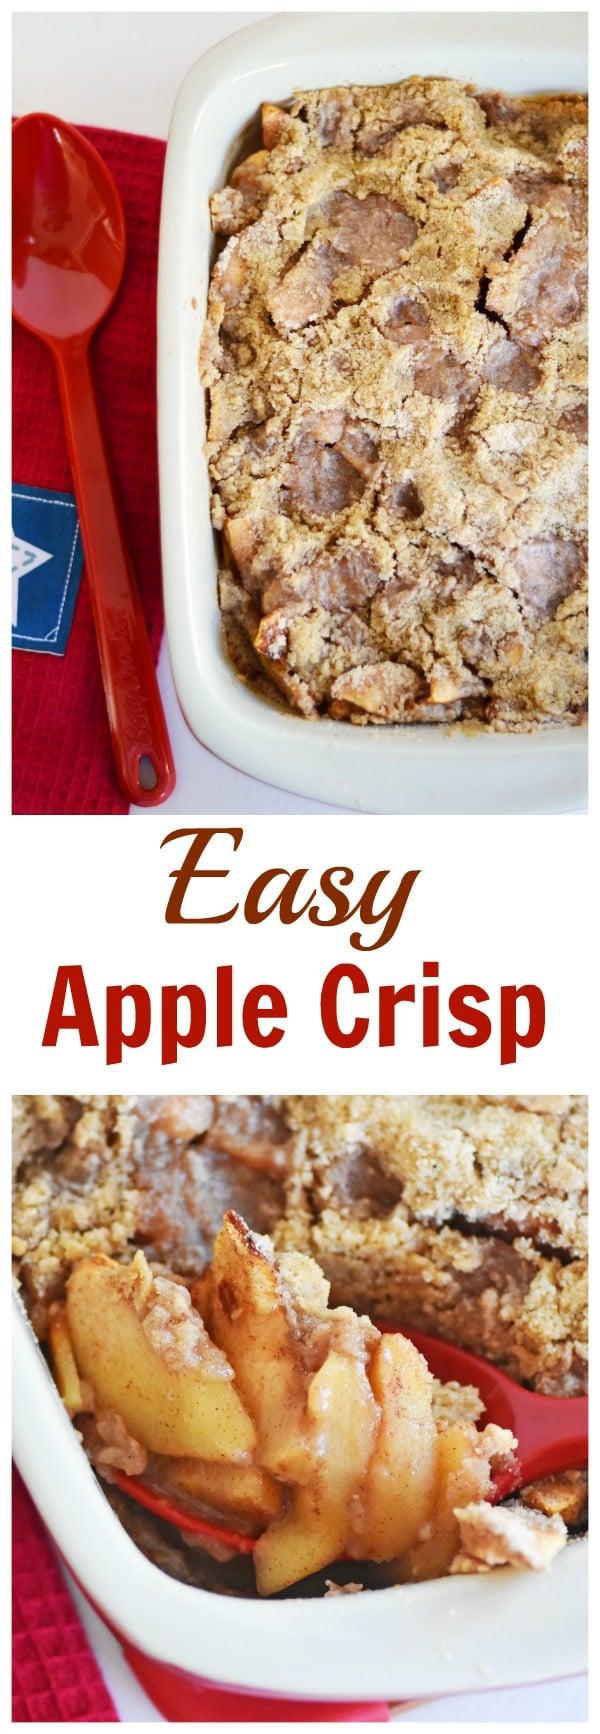 Easy Apple Crisp Recipe - Savvy Saving Couple